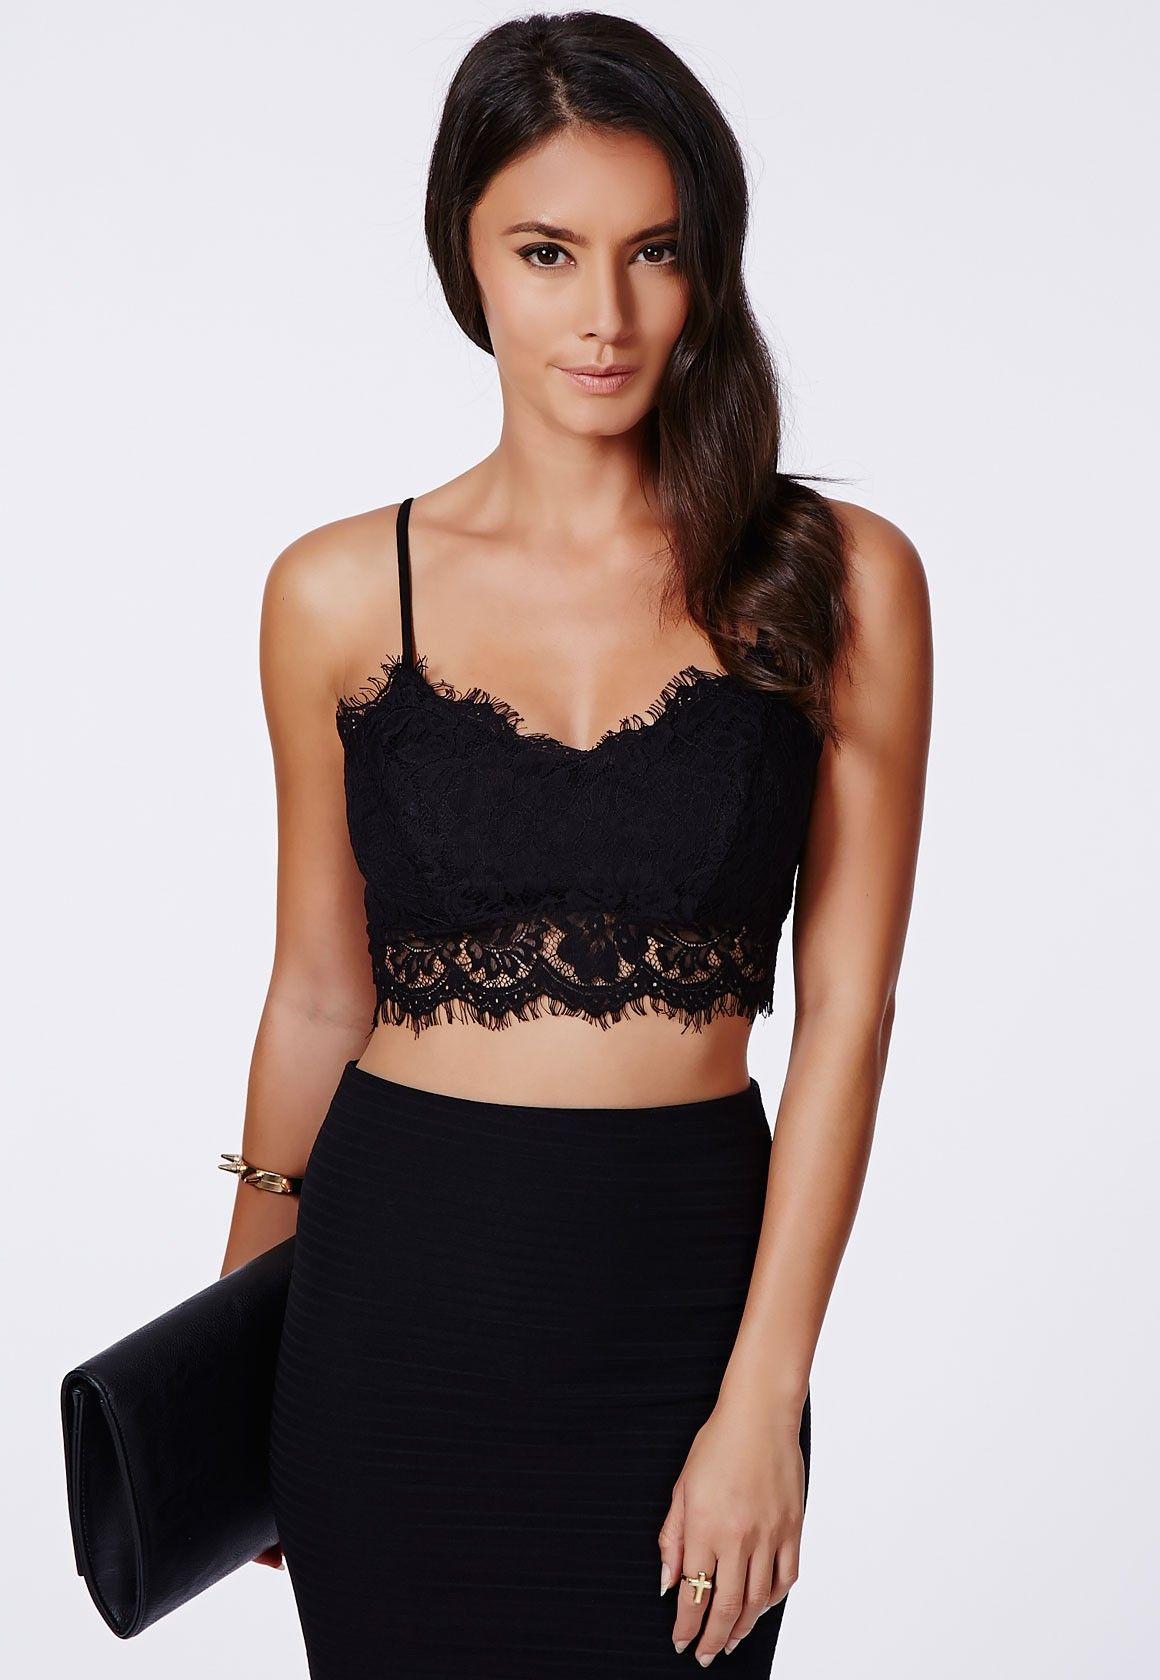 Chic Black Lace Bralette Outfit : Black Lace Bralette Outfit6 ...